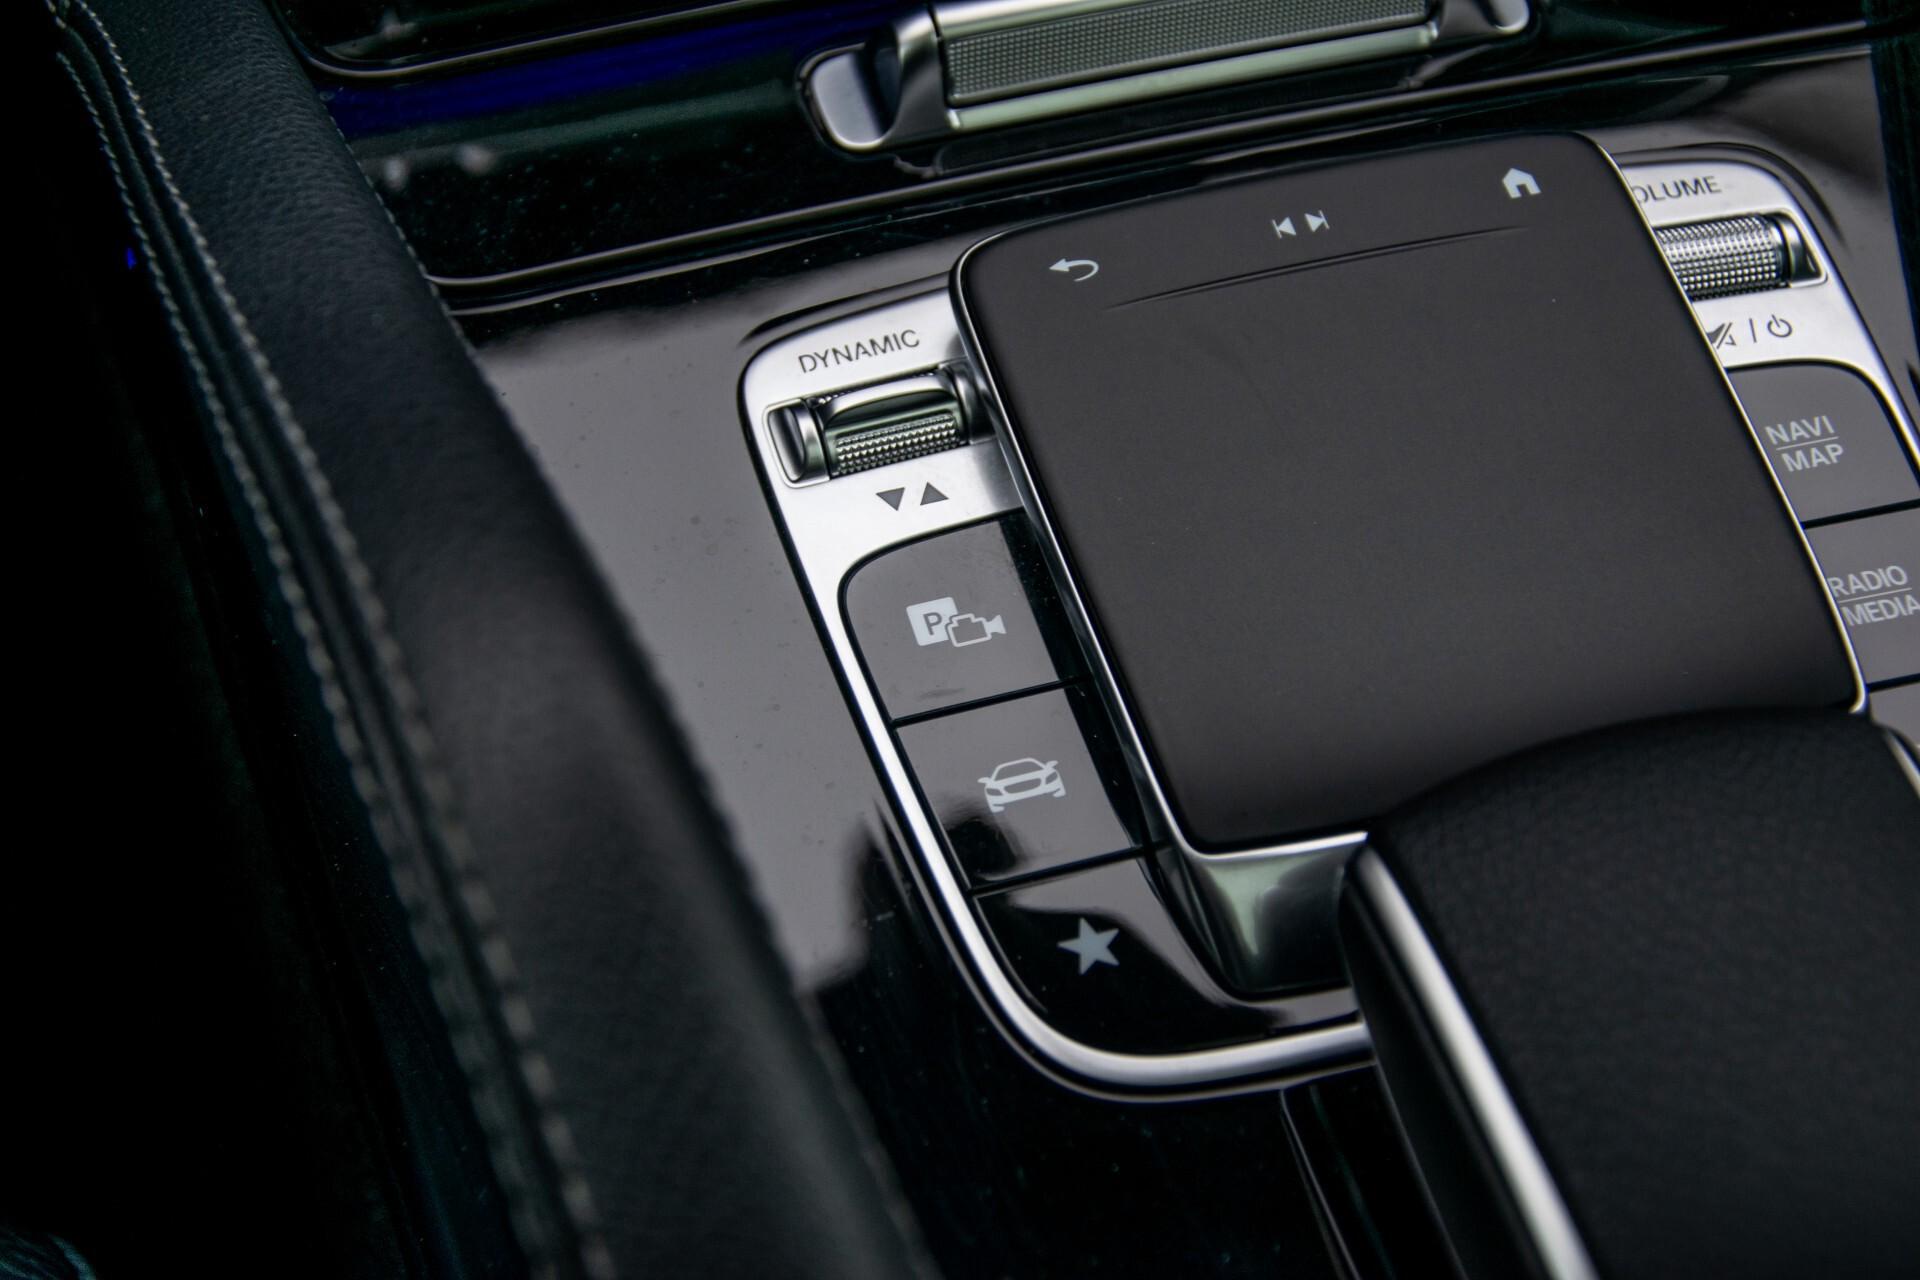 Mercedes-Benz GLE 450 4-M 7-Persoons AMG Massage/Rij-assist/Keyless/TV/360/Night/Trekhaak Aut9 Foto 60